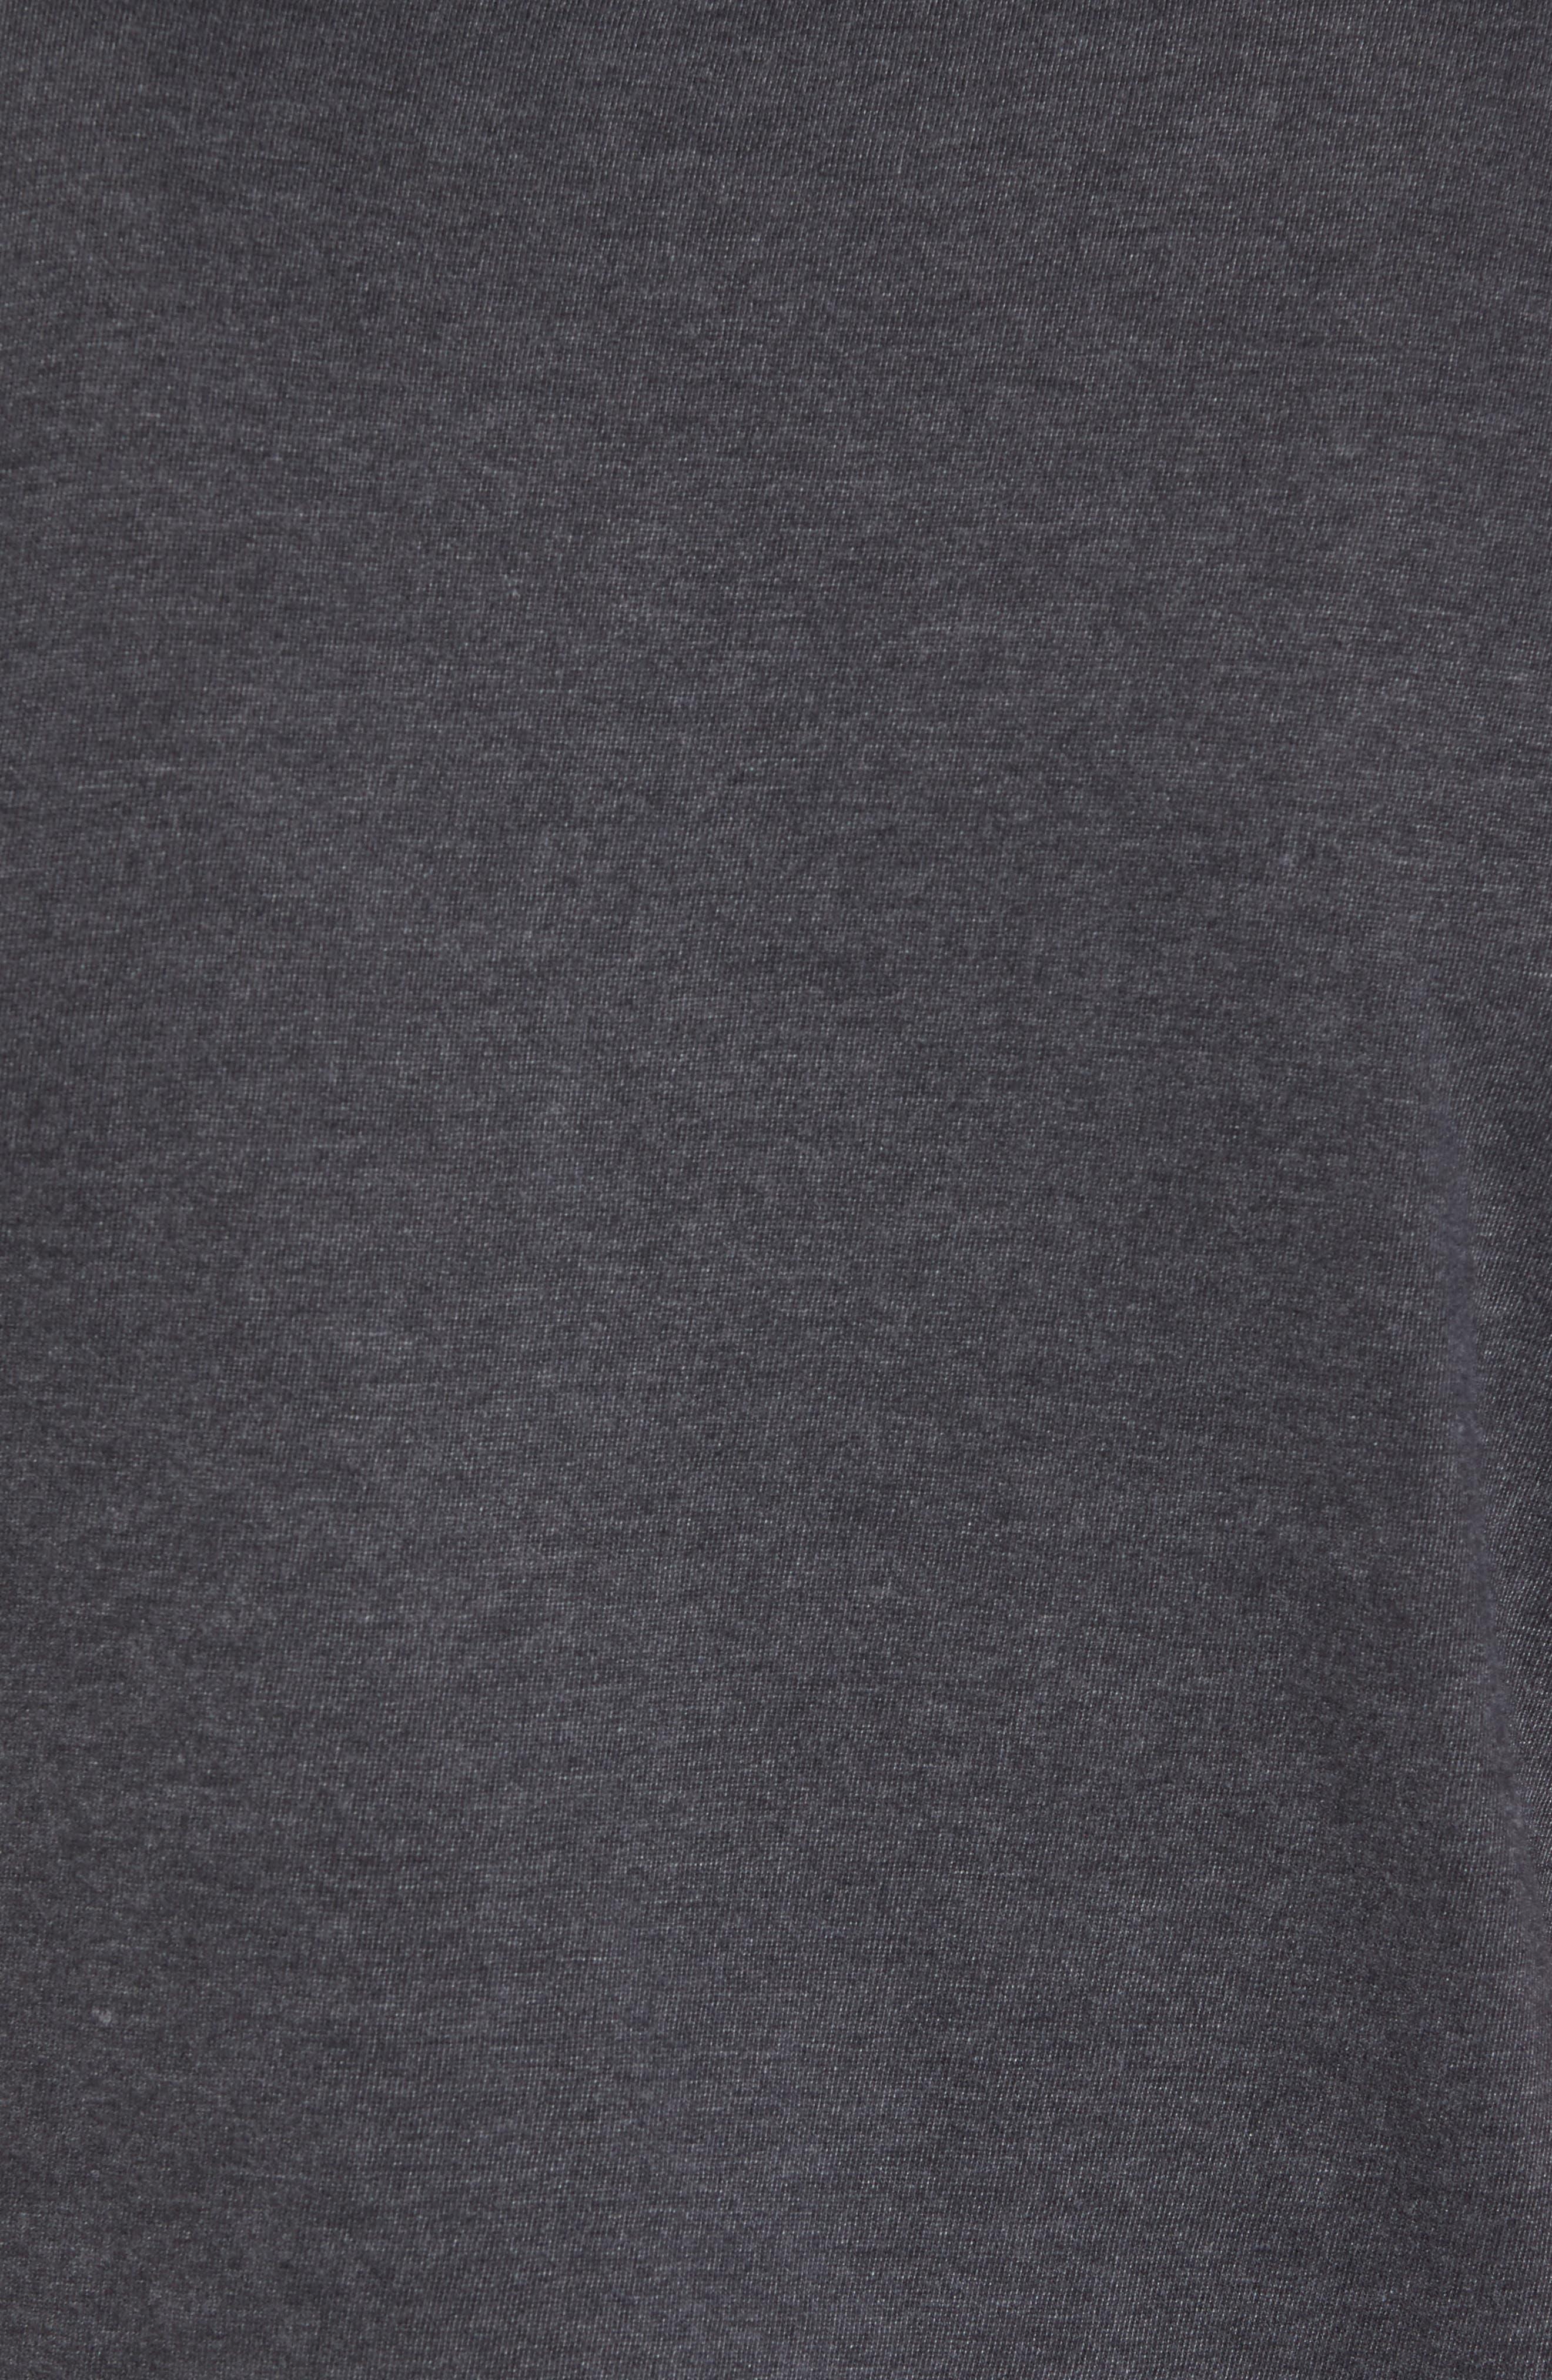 Hillwood San José Sharks Embroidered T-Shirt,                             Alternate thumbnail 5, color,                             Heather Black